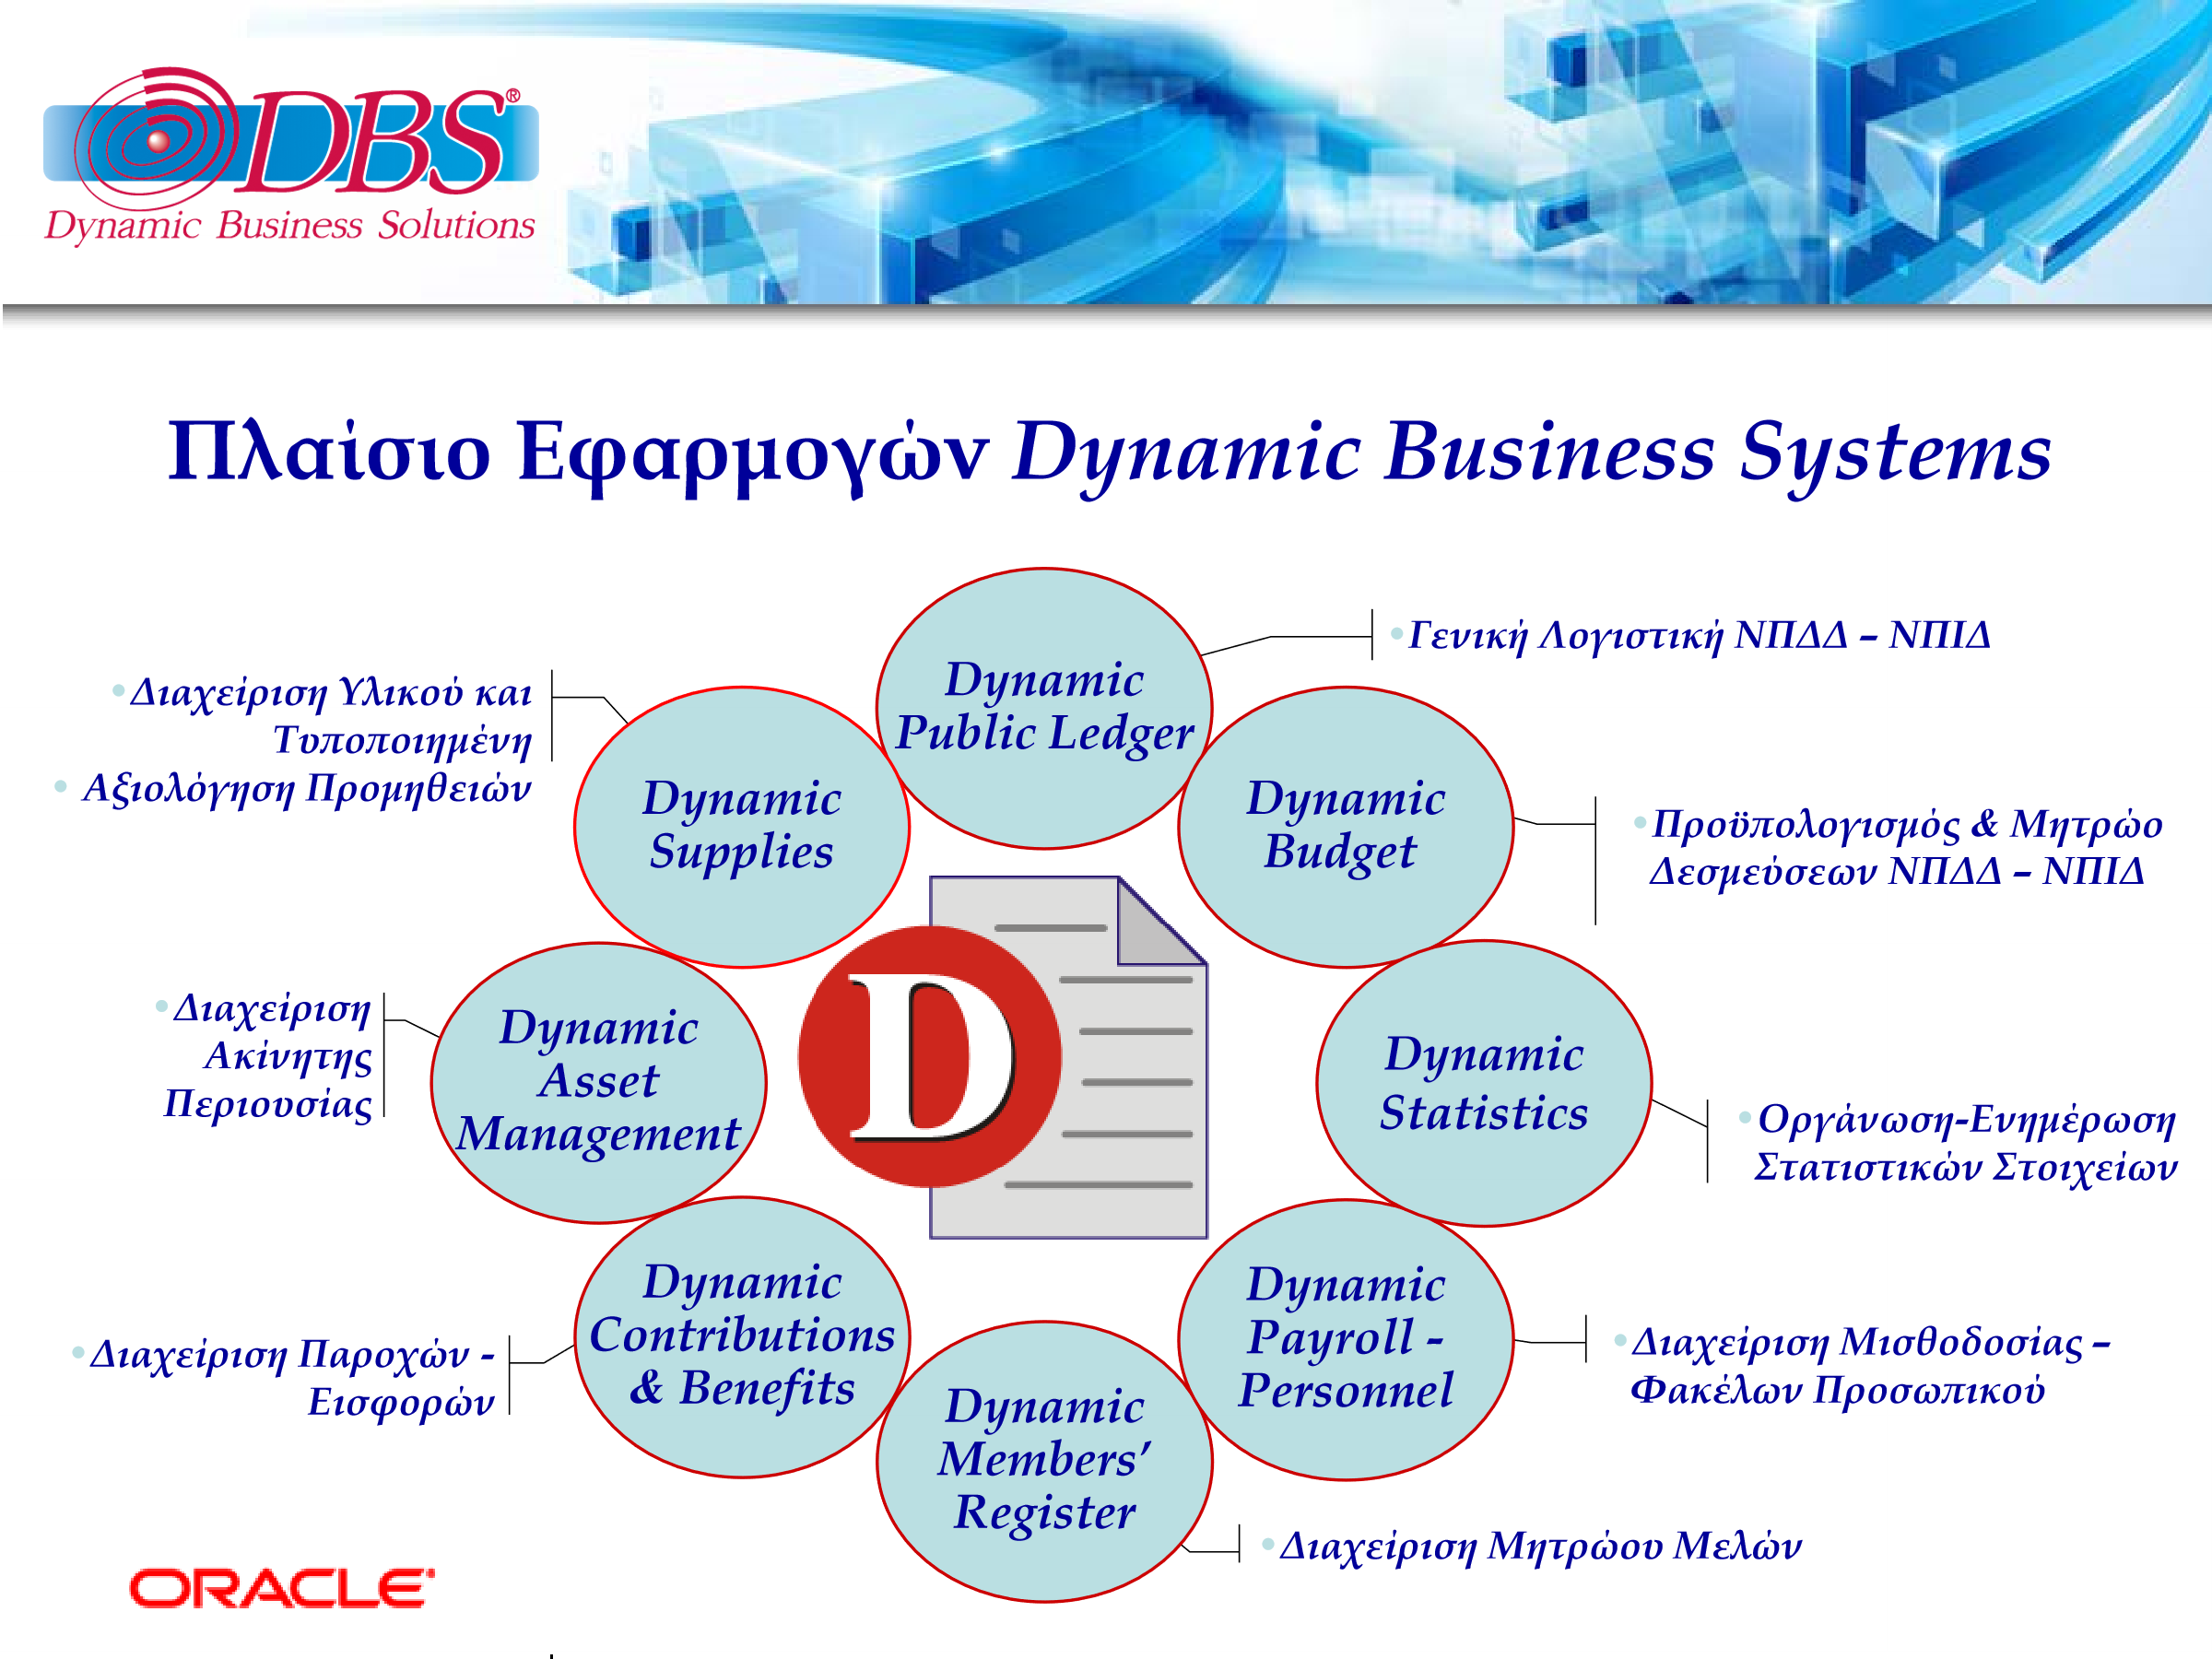 DBSDEMO2019_COMPANY_PROFILE_V18_R26FB-EL-16